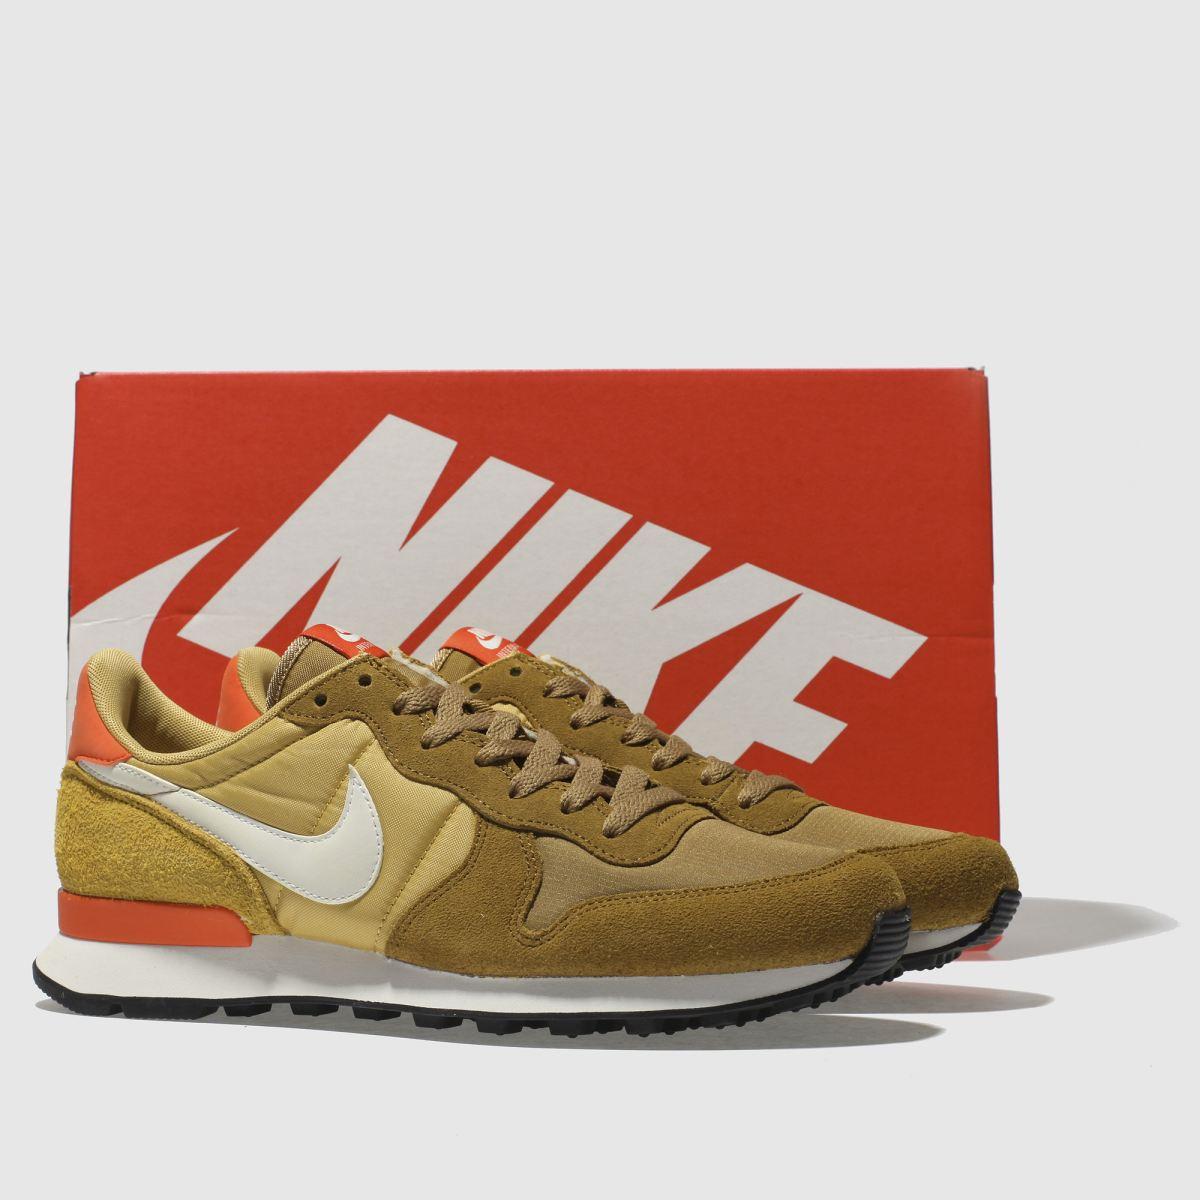 Damen Bronze Gute nike Internationalist Sneaker | schuh Gute Bronze Qualität beliebte Schuhe 8b8fef